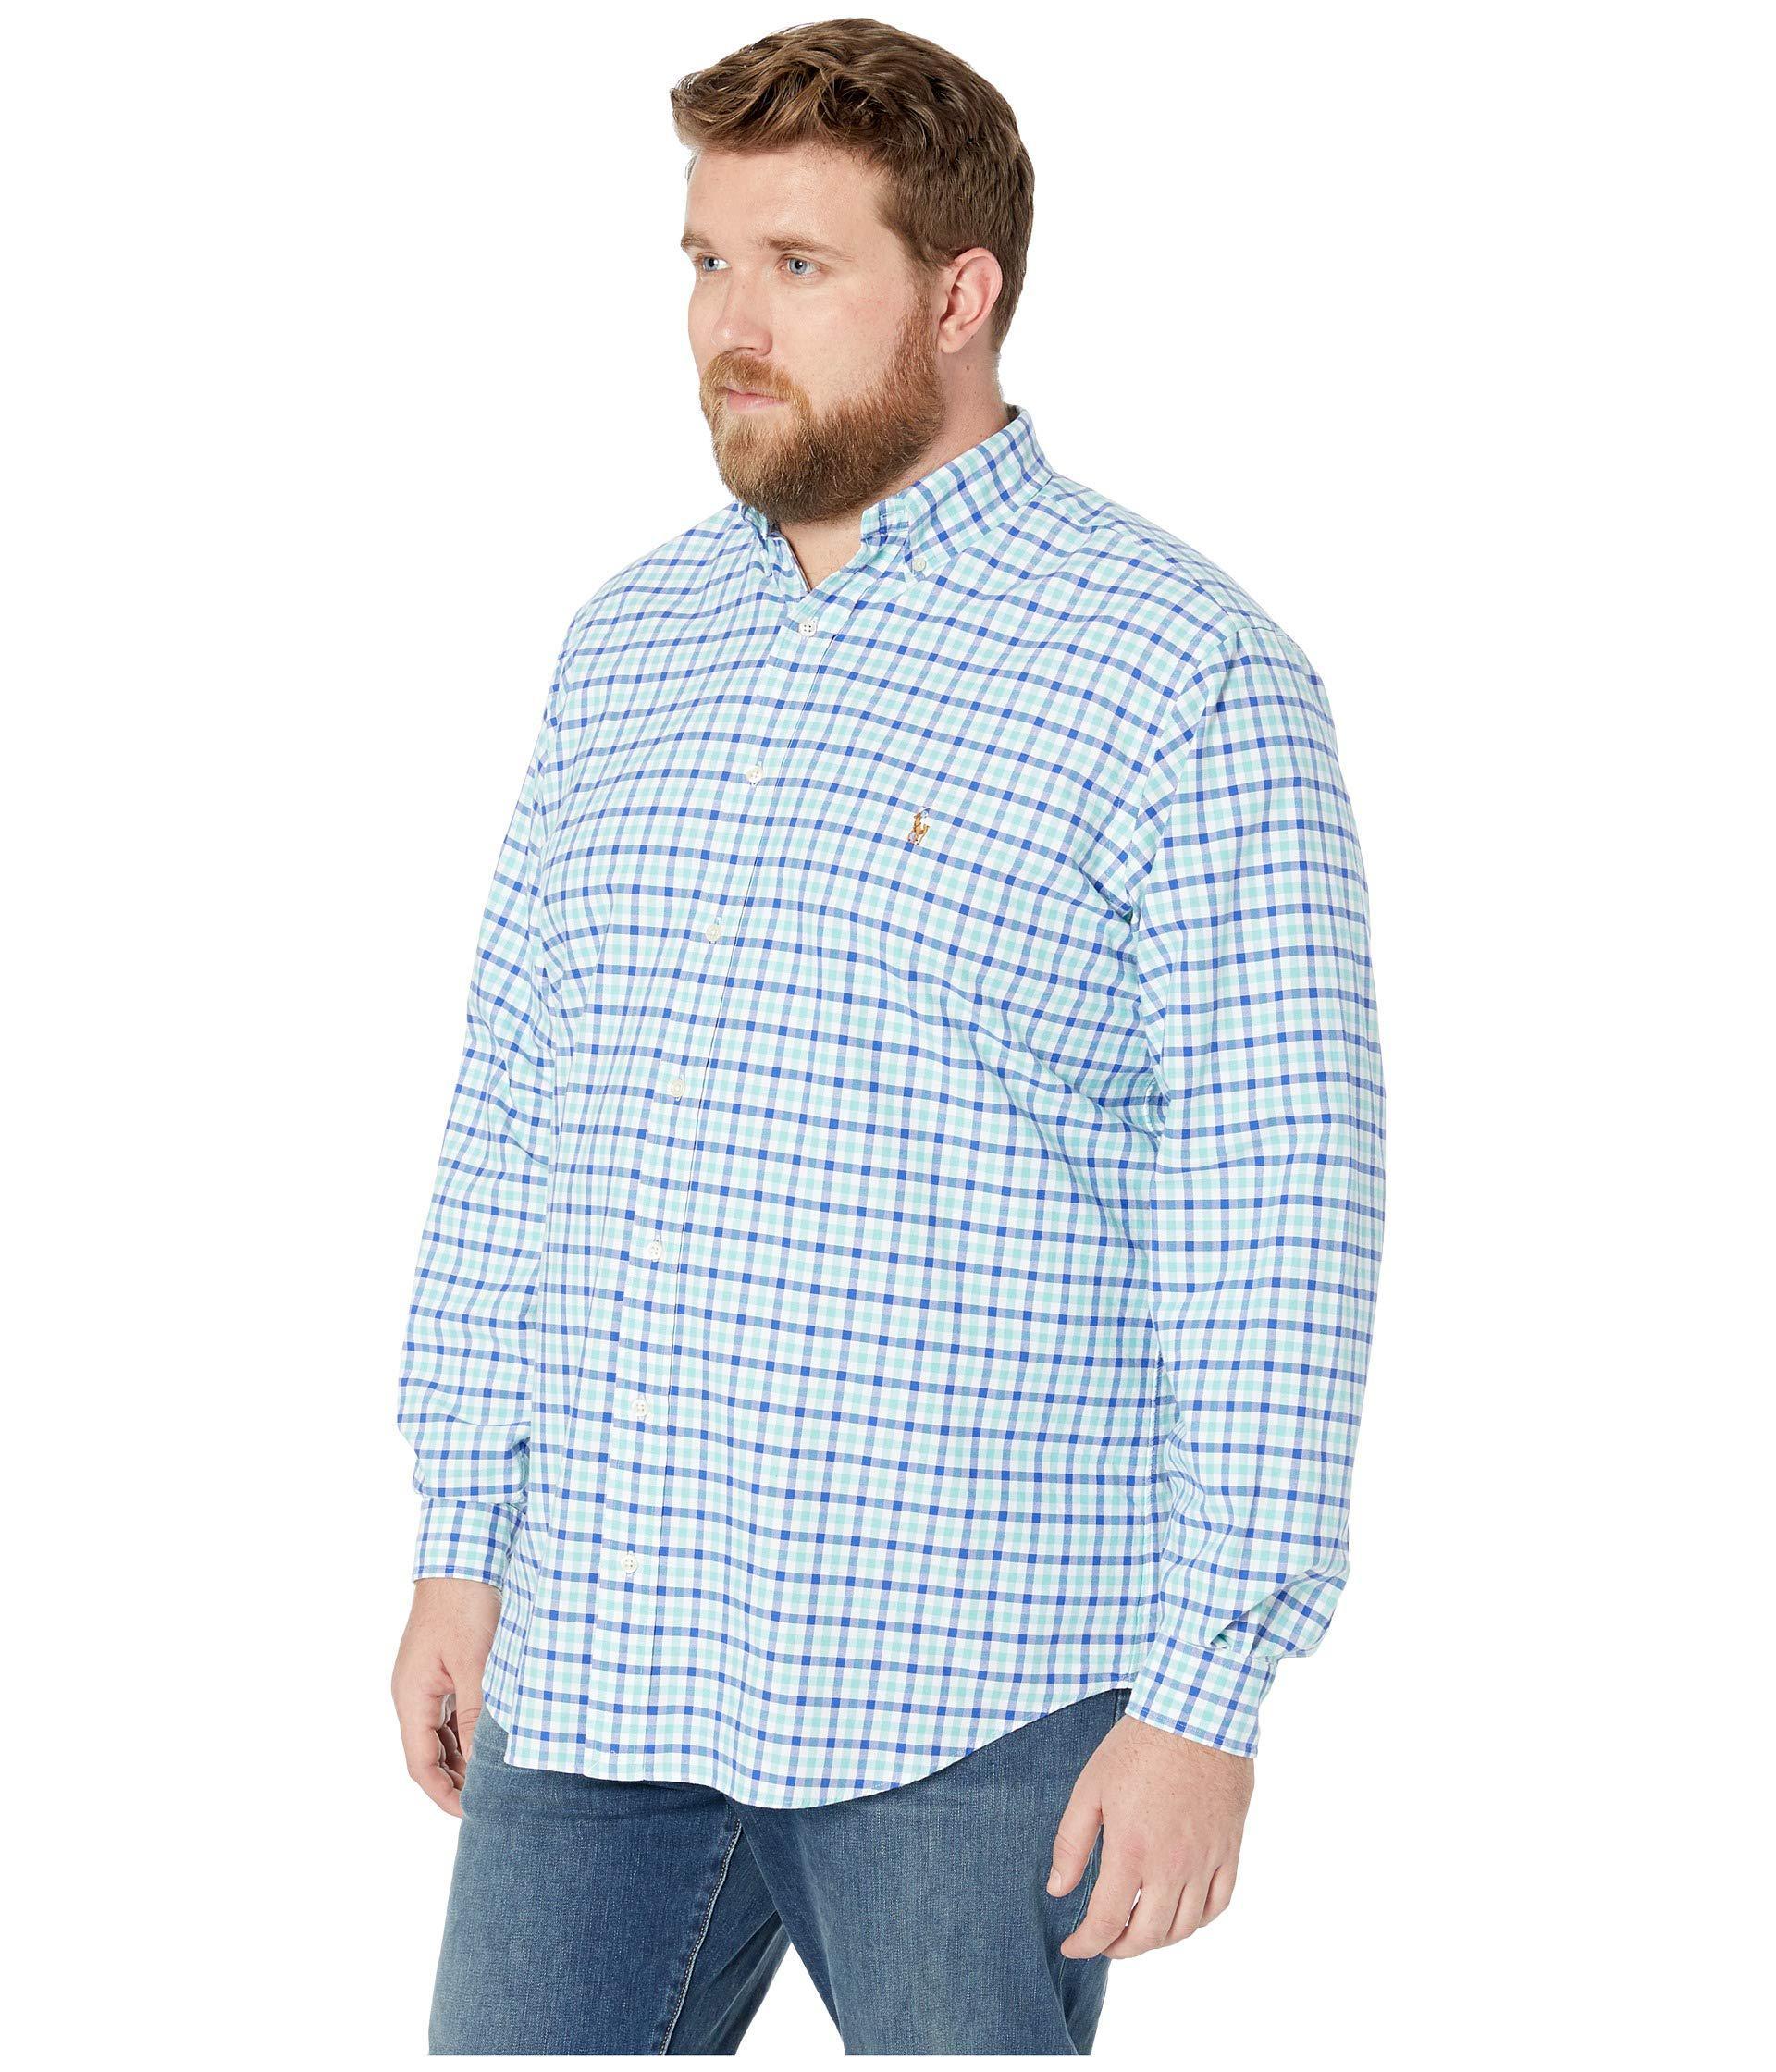 02406c135 Polo Ralph Lauren - Big Tall Oxford Long Sleeve Classic Fit Shirt  (seafoam/blue. View fullscreen